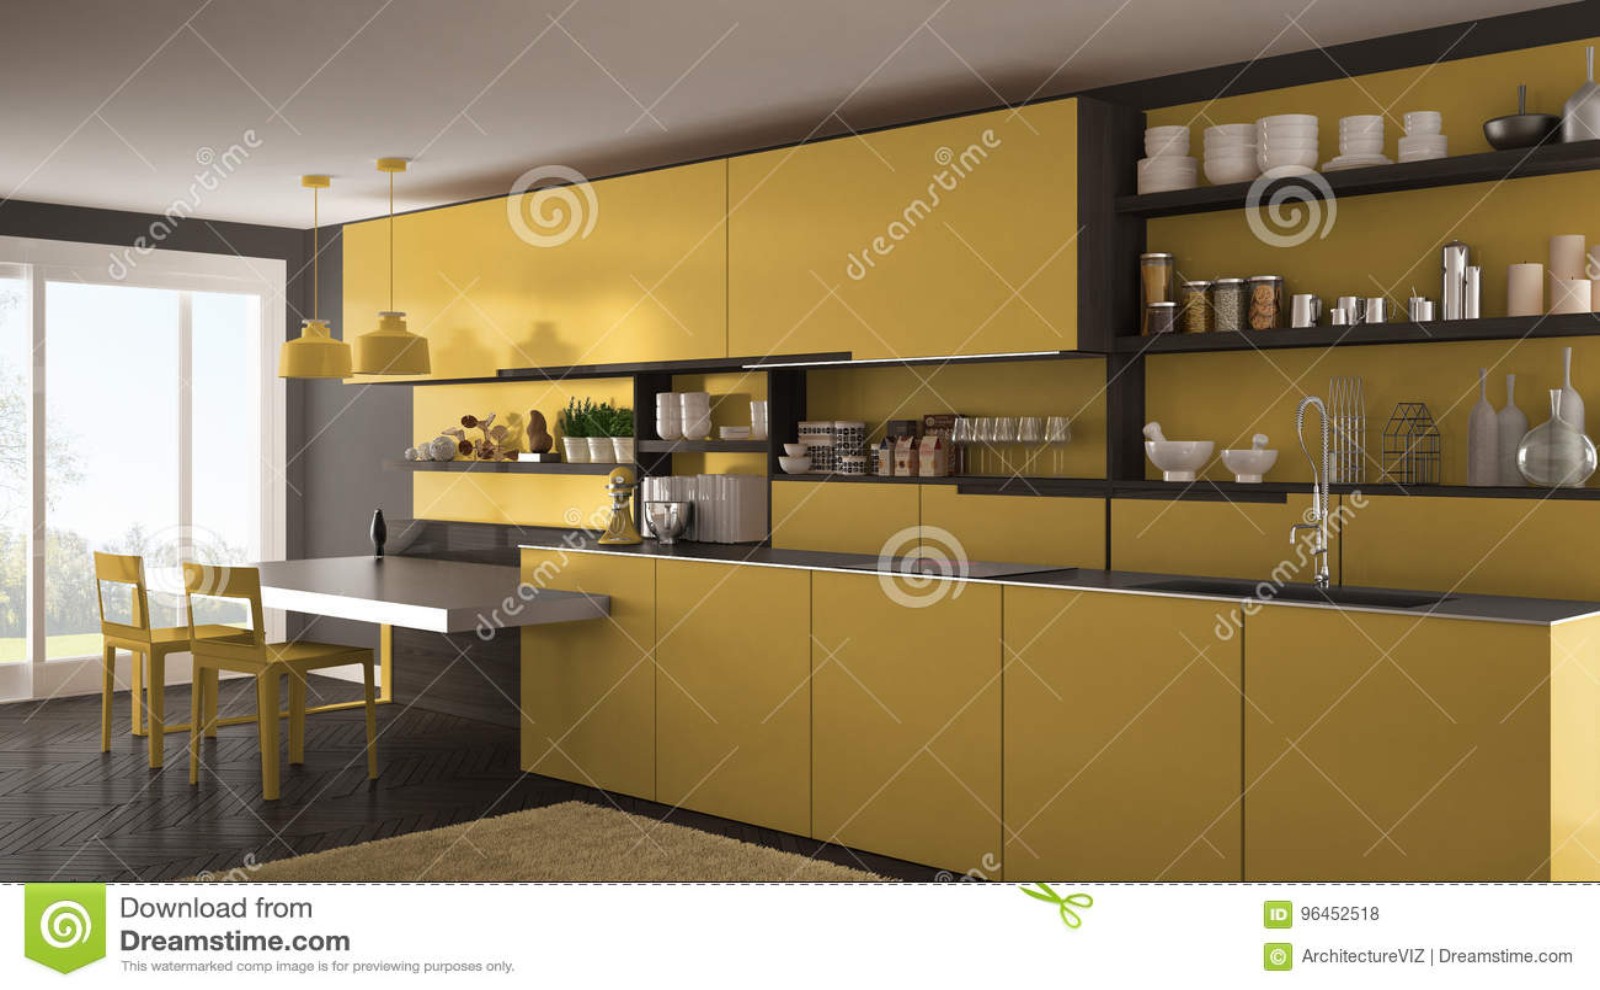 modern kitchen rugs wrought iron table 有木细节 桌和椅子的最低纲领派现代厨房 库存例证 插画包括有地毯 桌和椅子的 黄色室内设计最低纲领派现代厨房